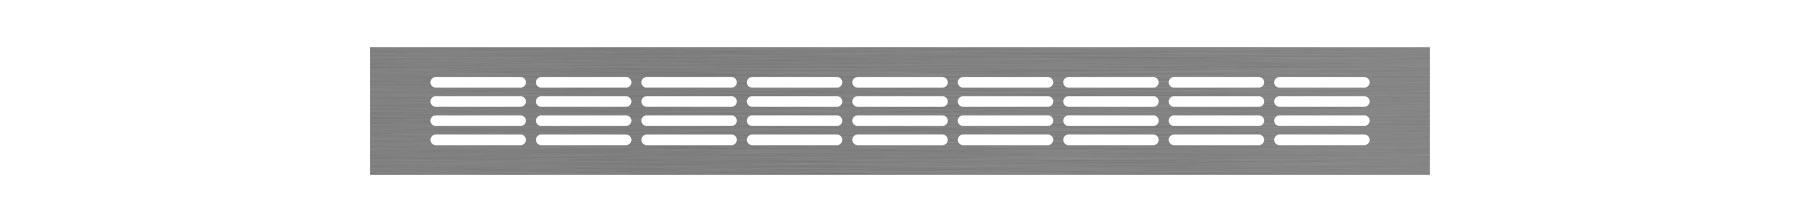 VRS-000B - Ventilaciona rešetka 60×500 mm